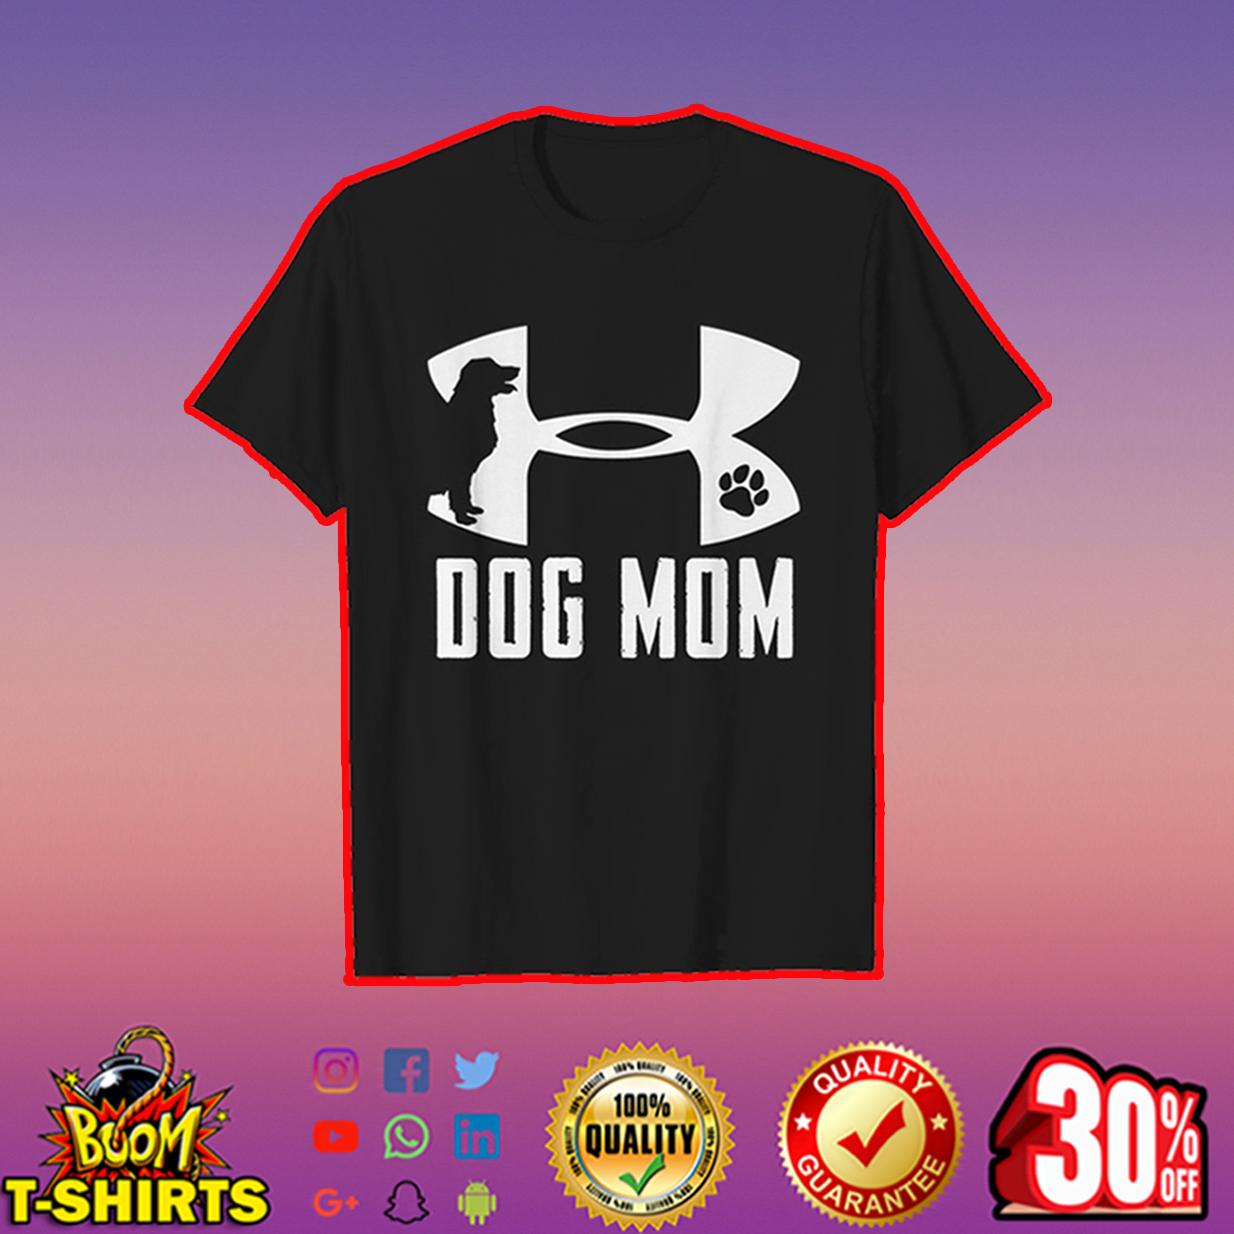 Under Armour Dog Mom t-shirt